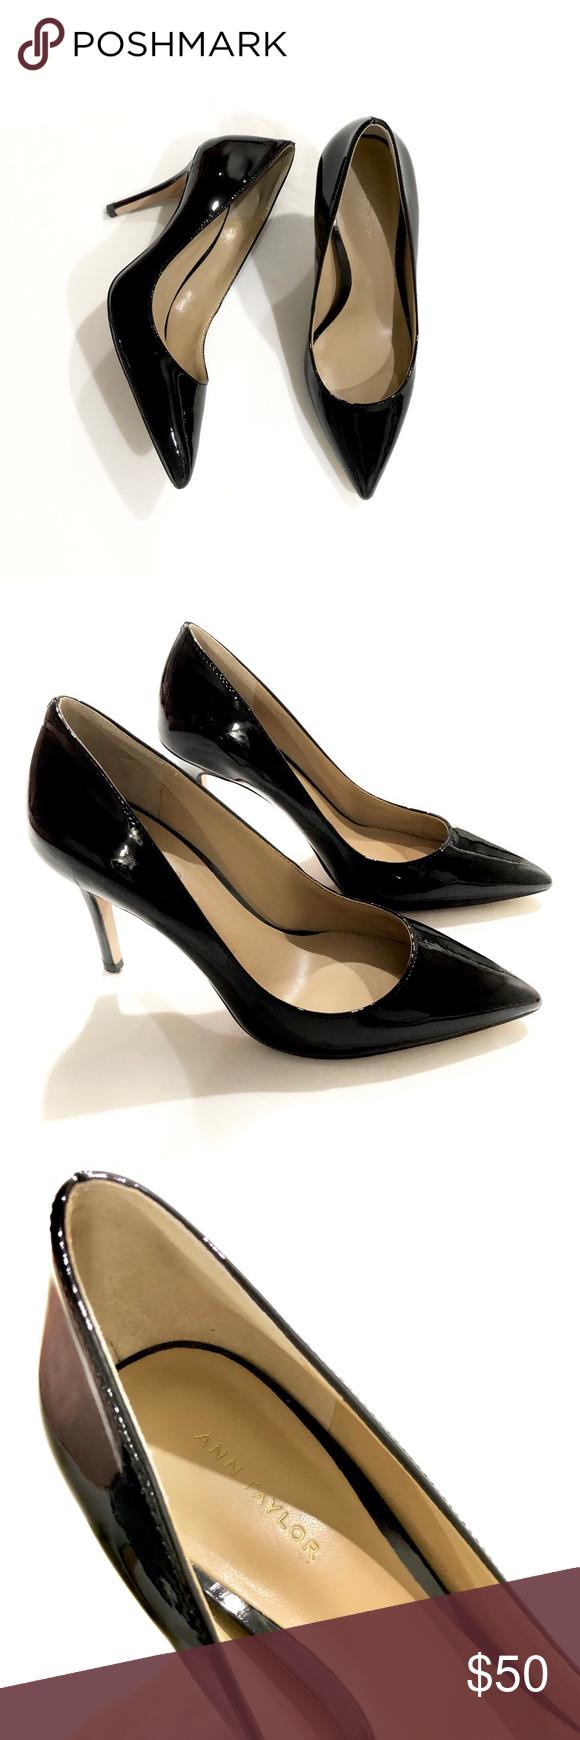 Hades Alternative Shoes Katja Black Pumps High Heels